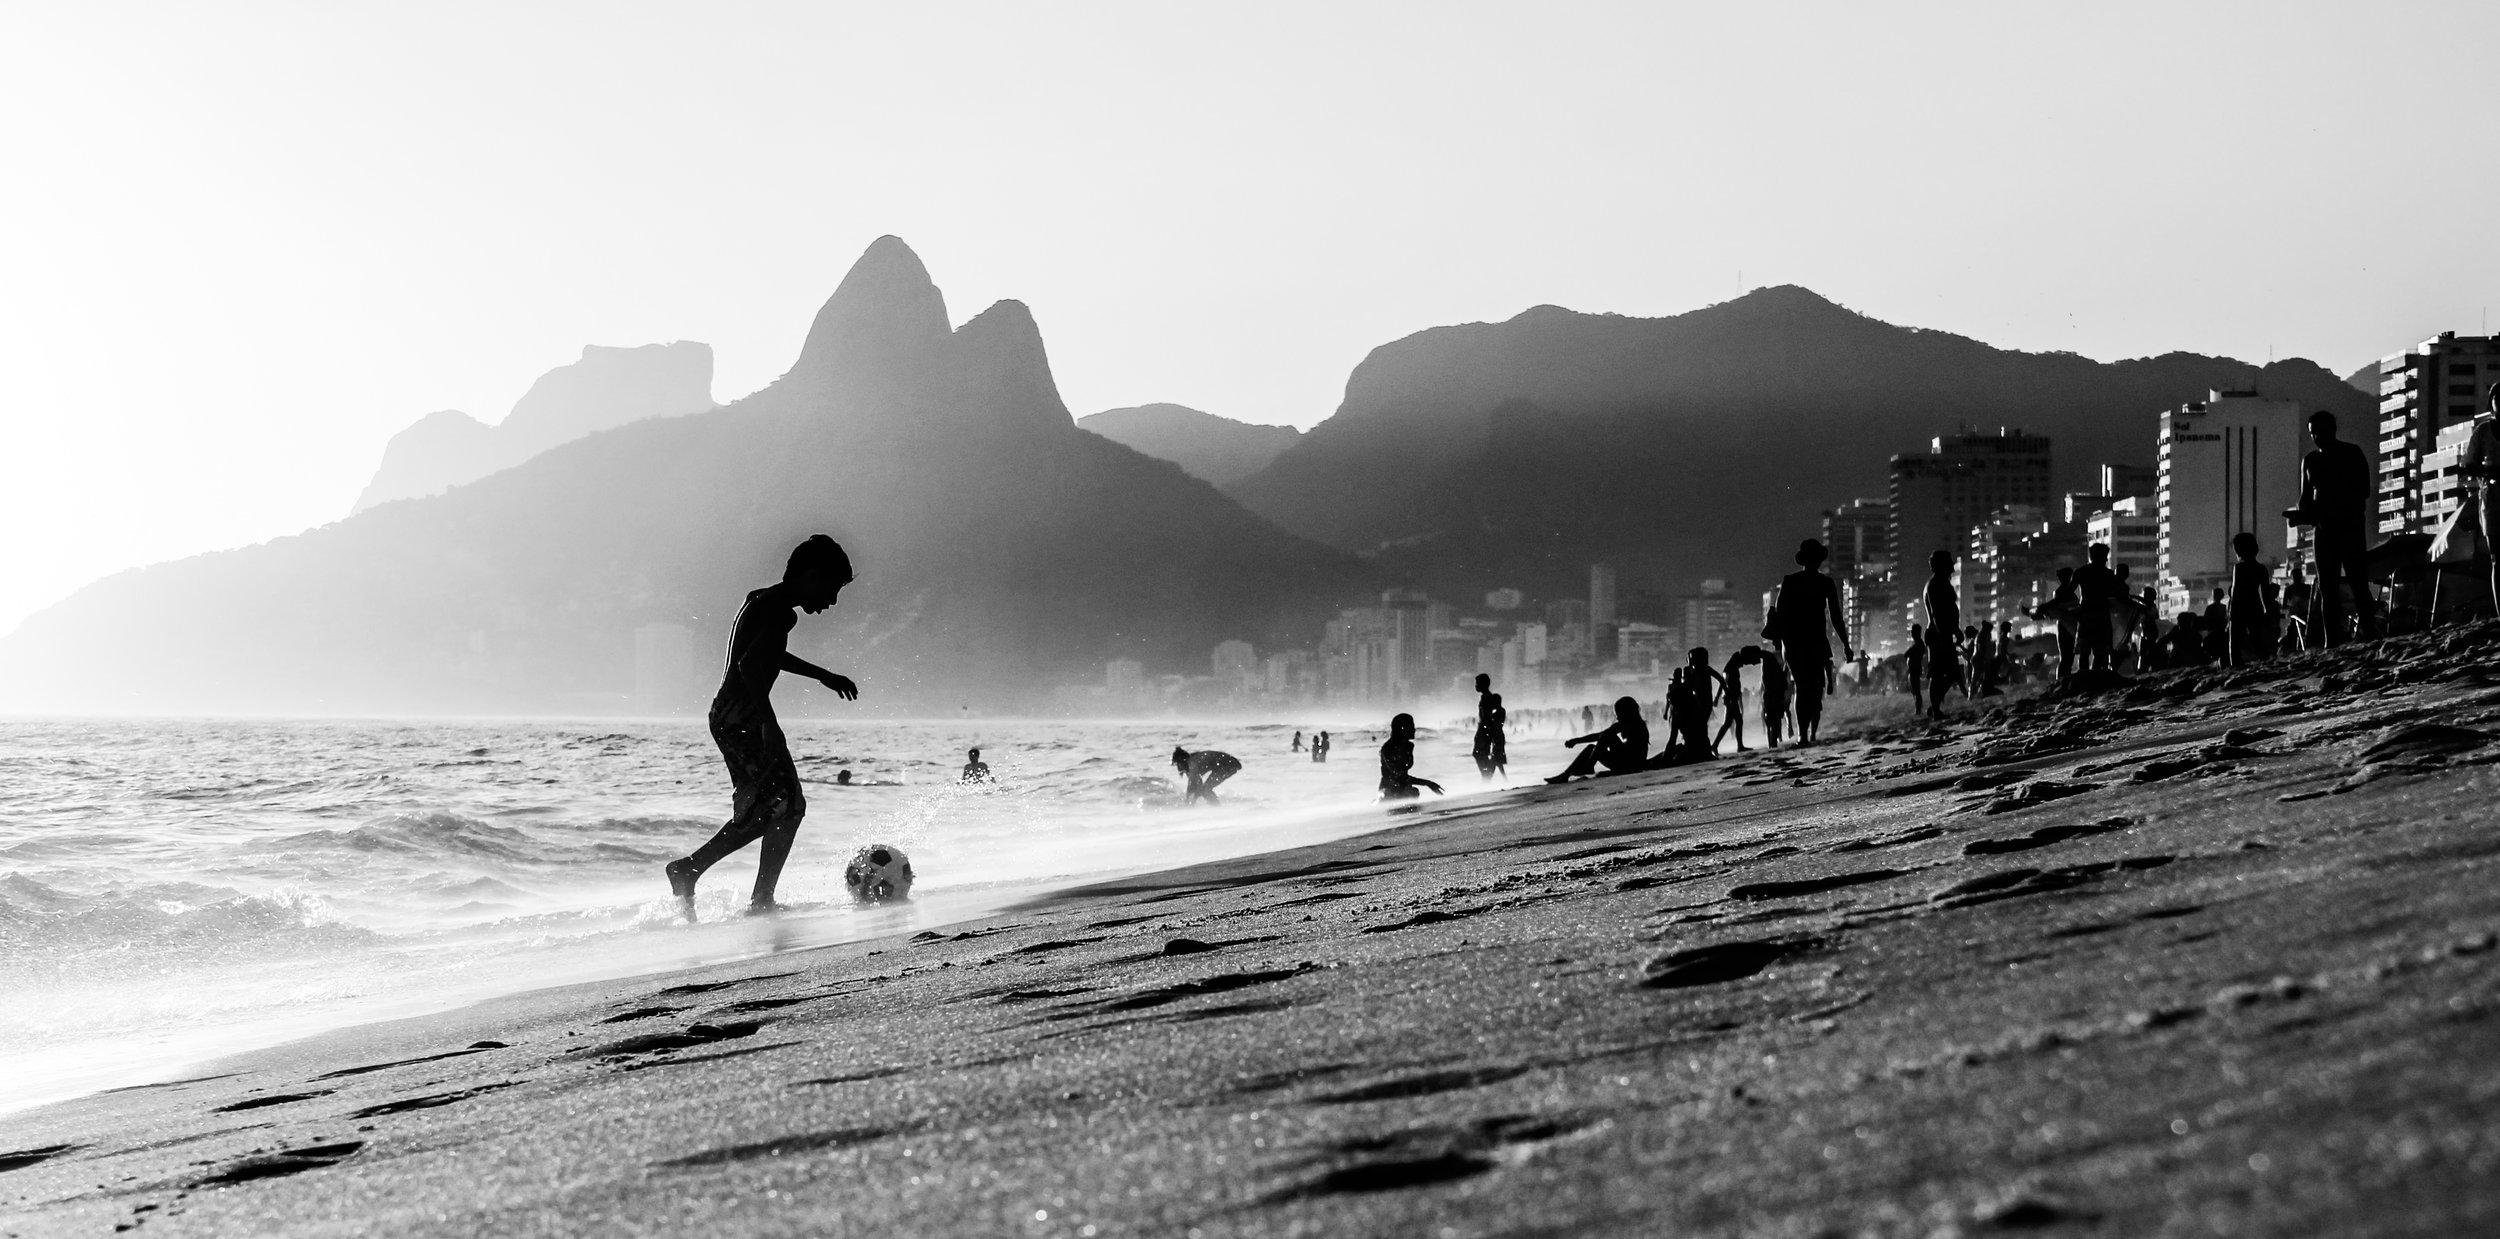 Saída de bola. Rio de Janeiro - RJ.